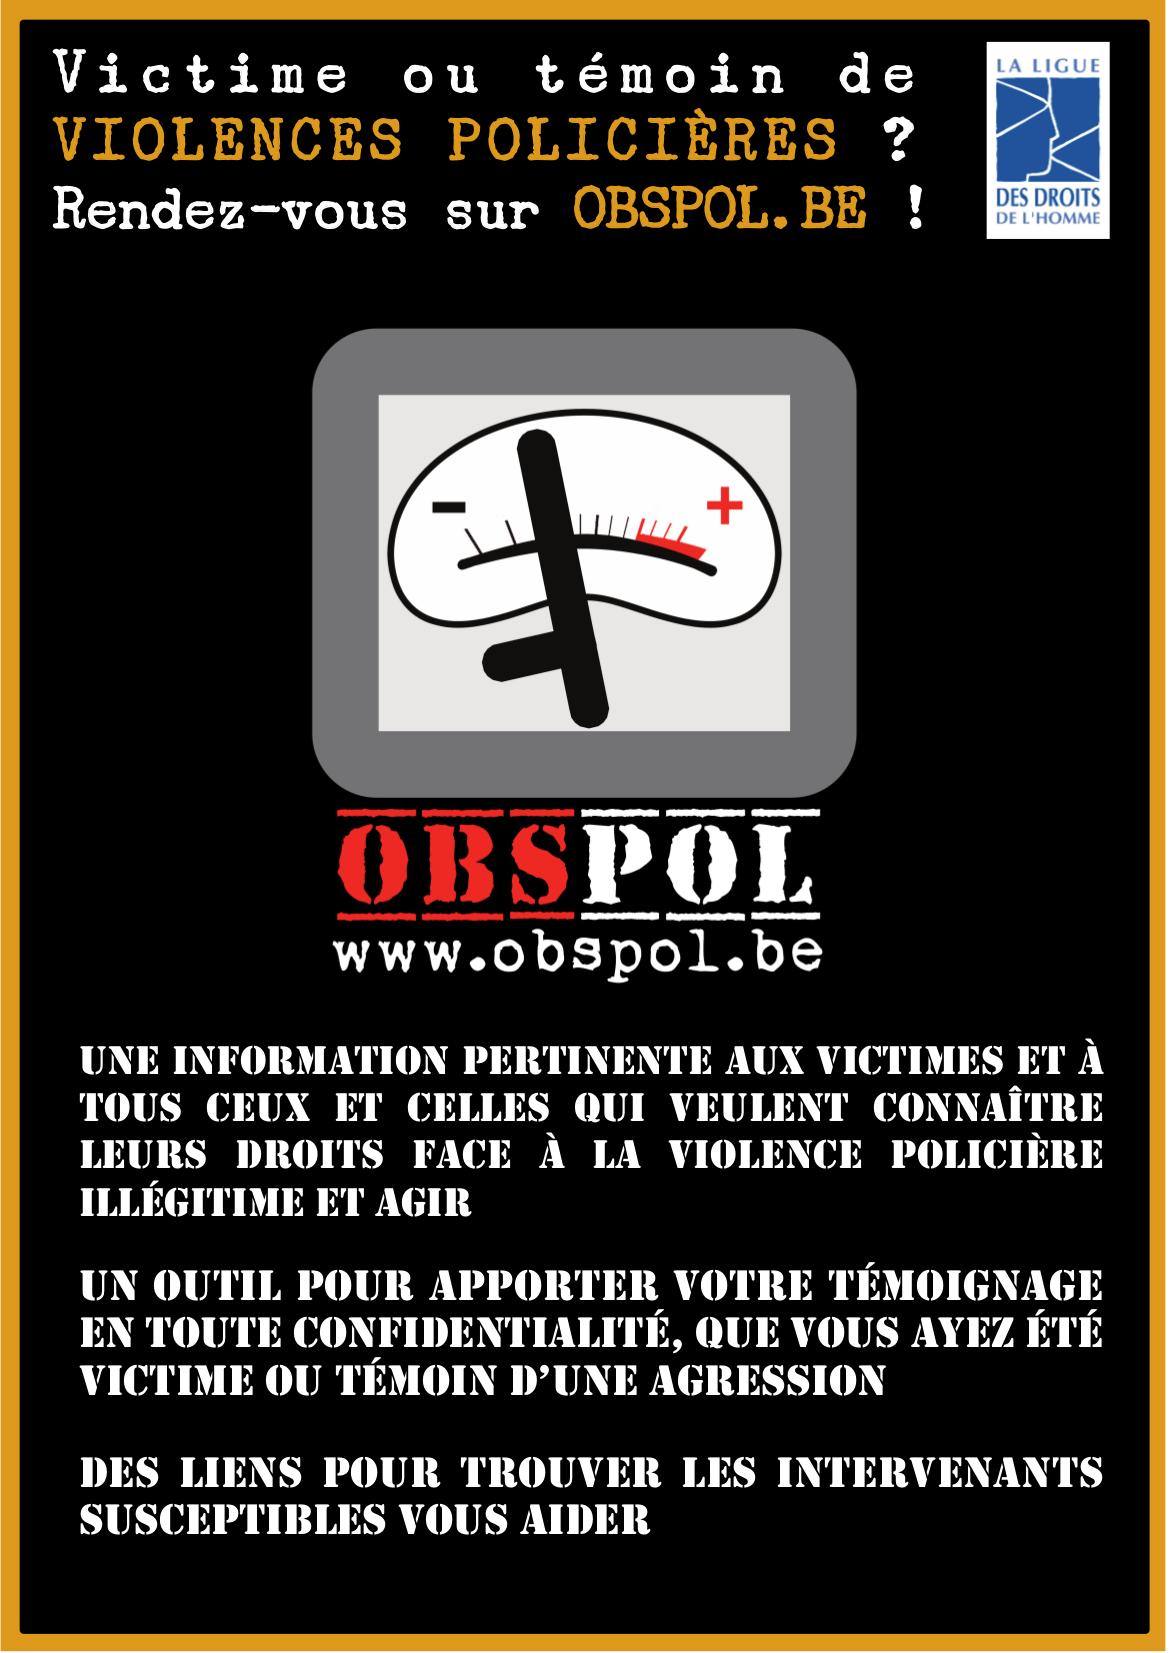 BEL_ObsPol_Poster_A3_Quadri-Noir/png